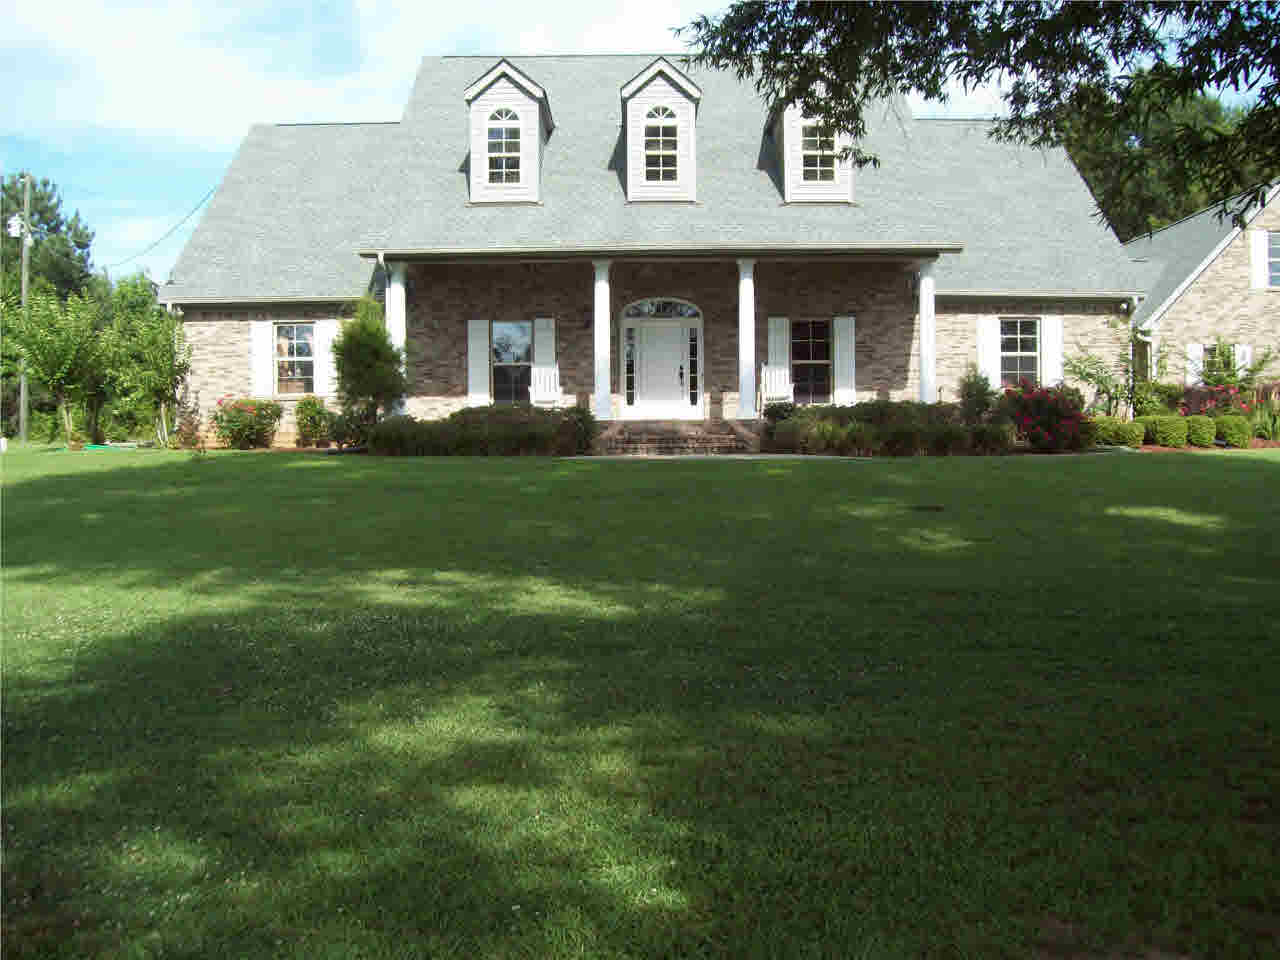 Real Estate for Sale, ListingId: 34721744, Morton,MS39117